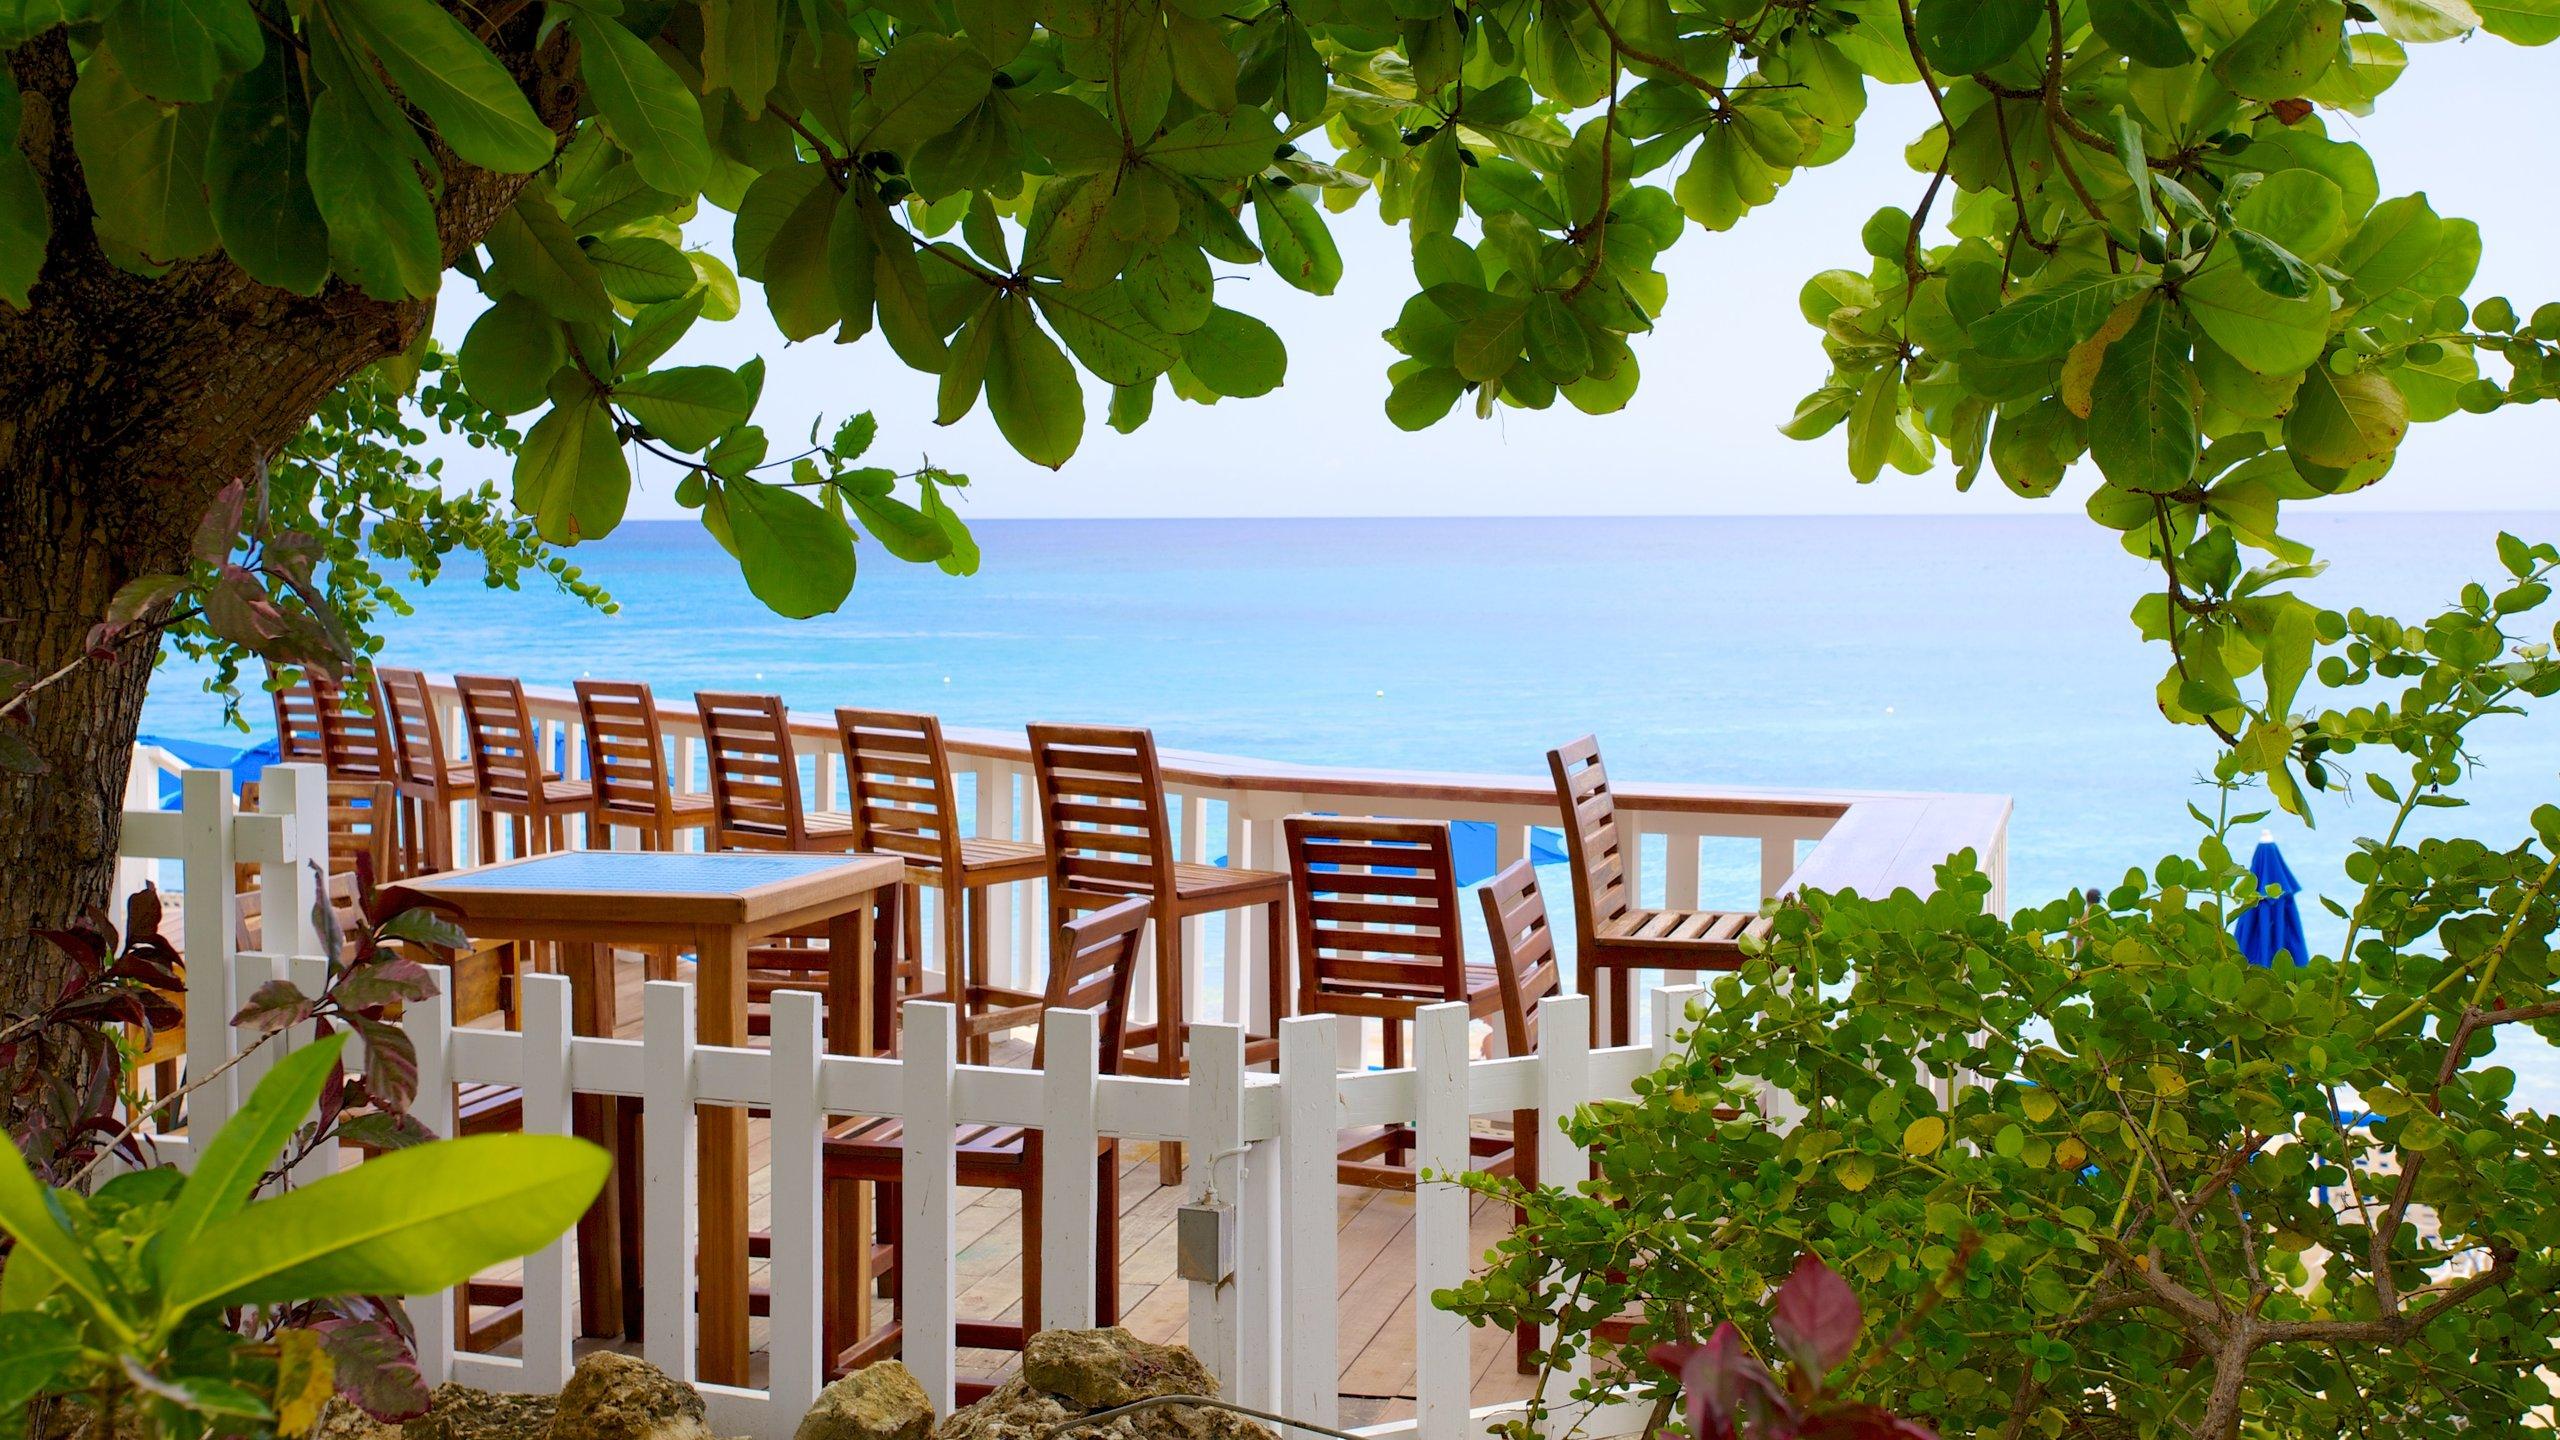 Mullins, St. Peter, Barbados